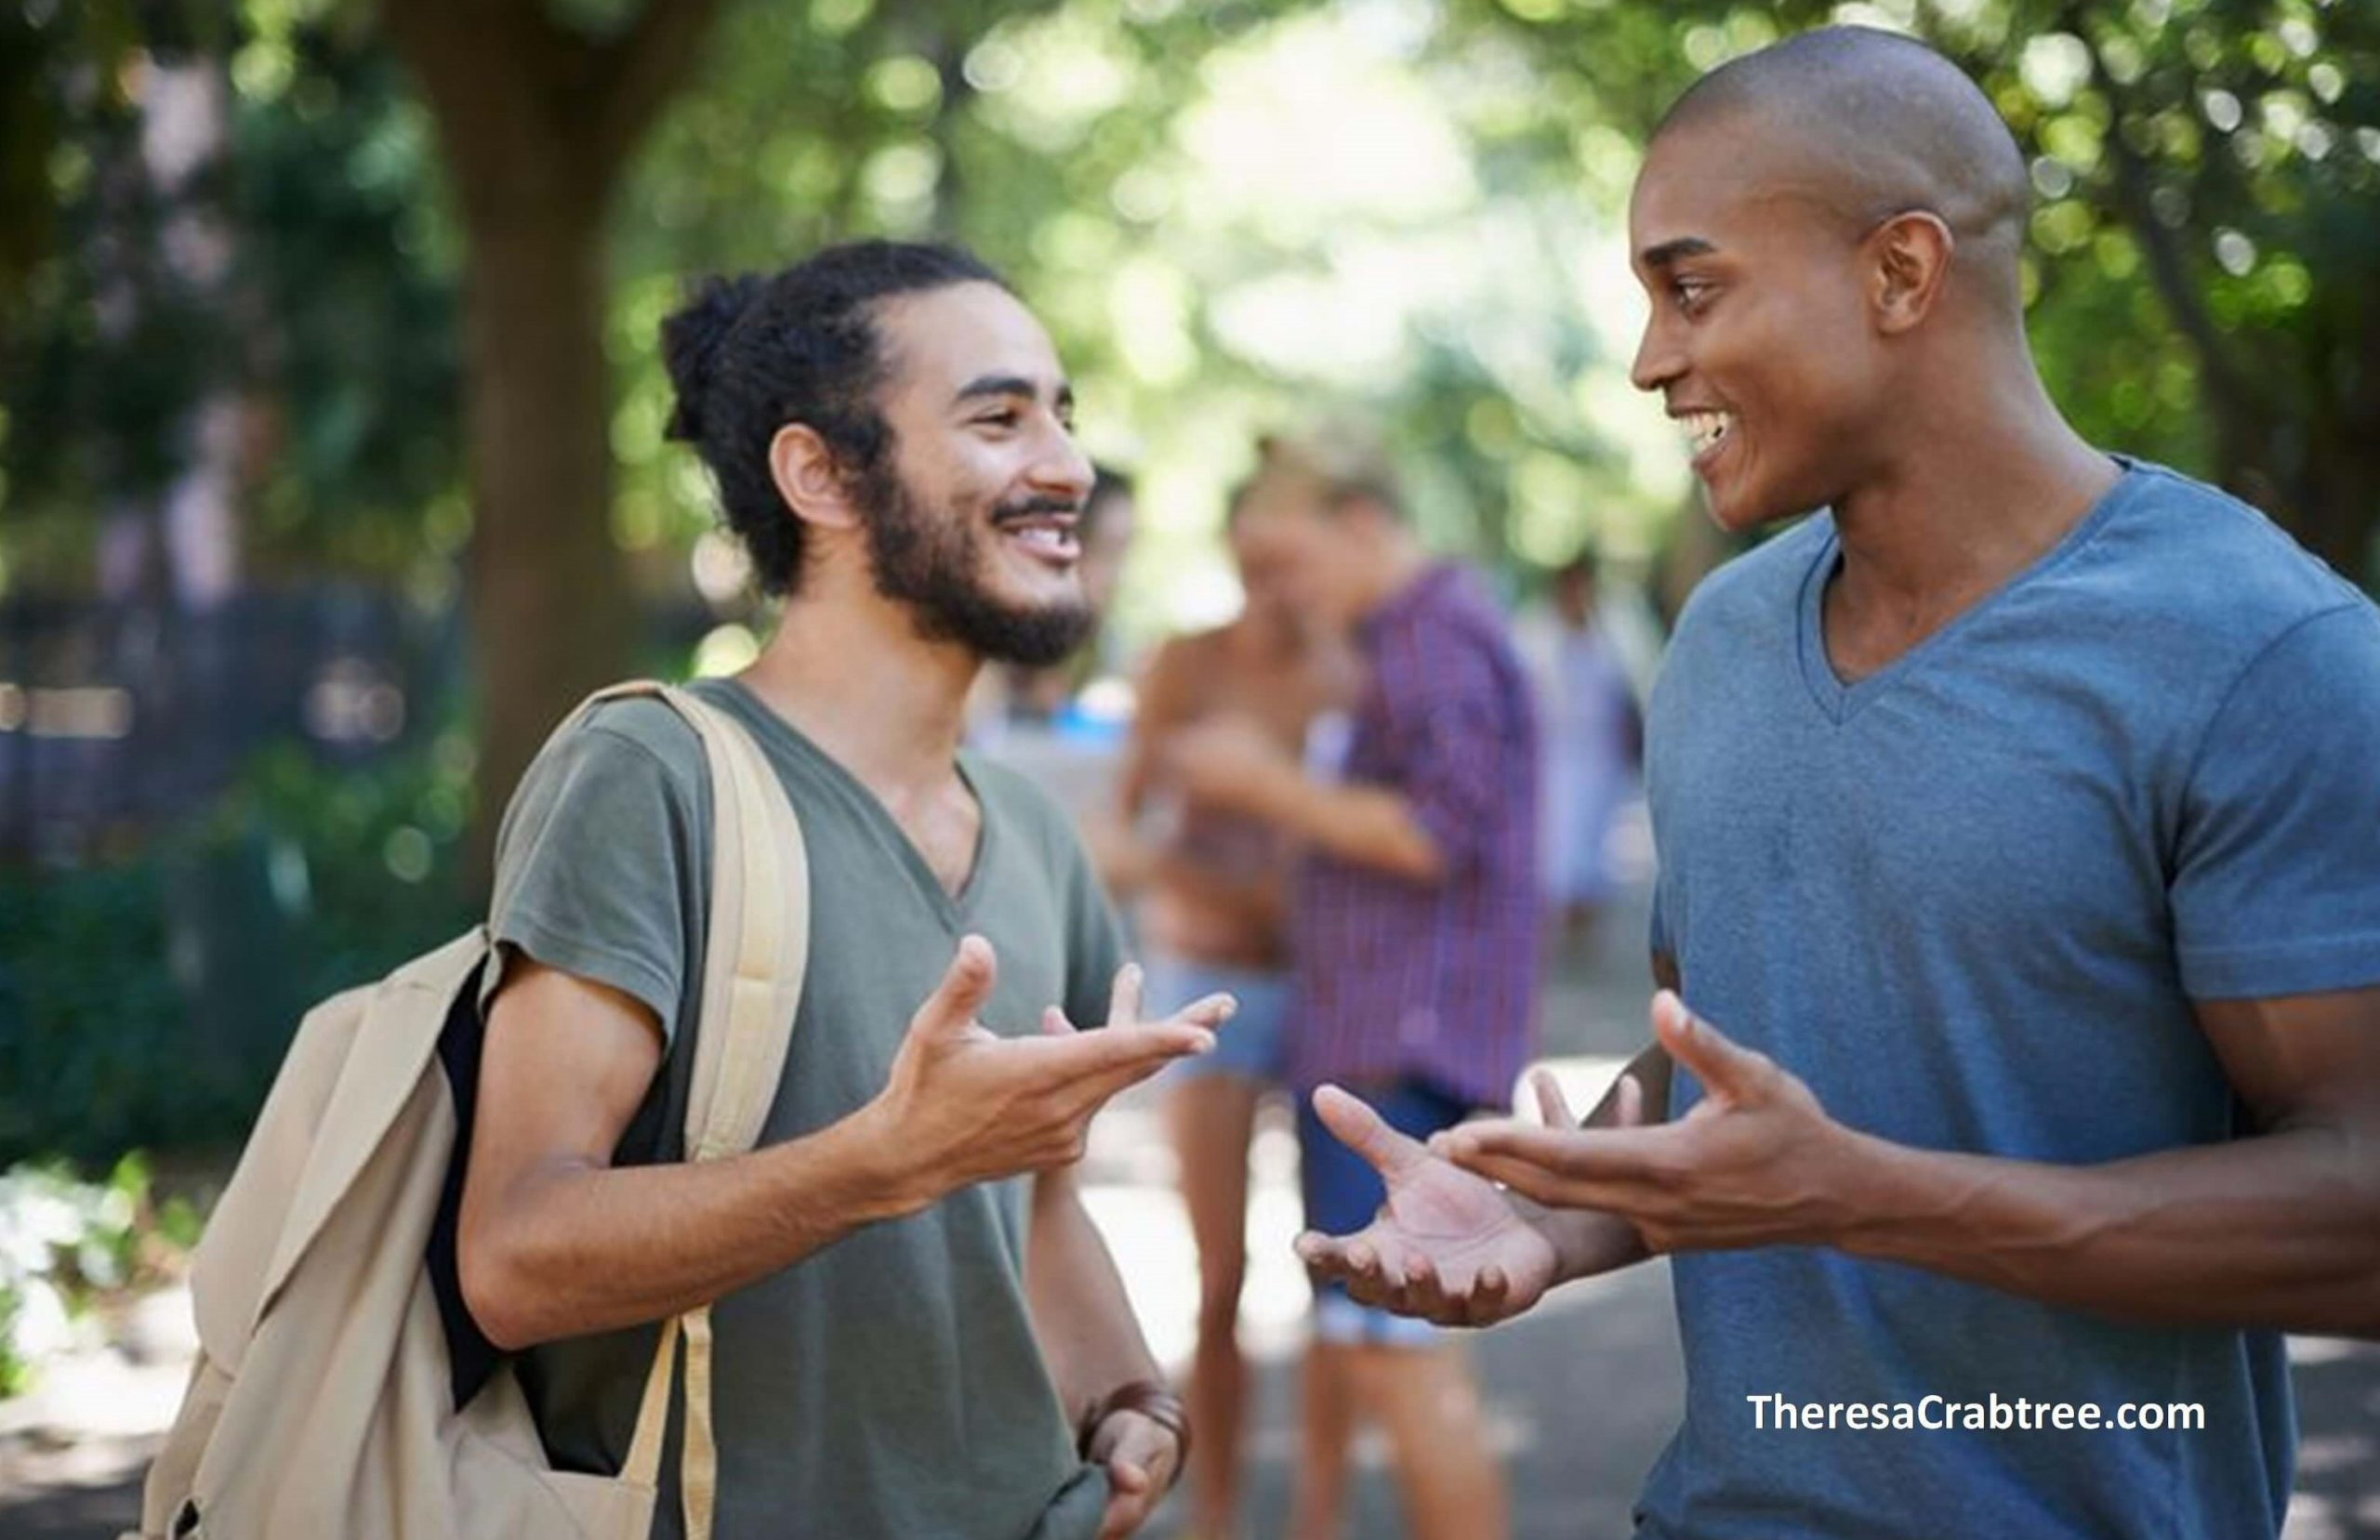 10 Conversation Tips